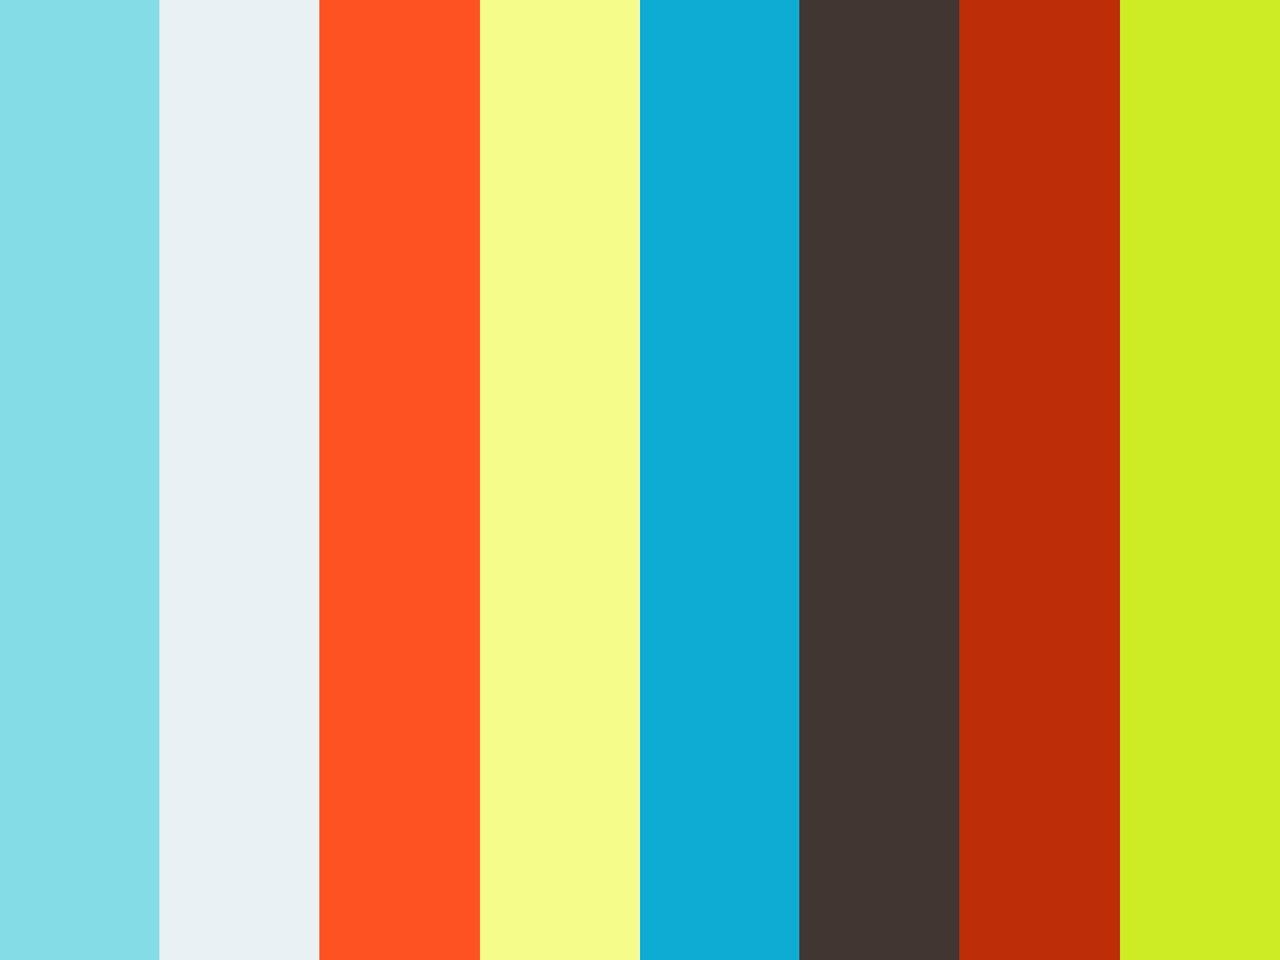 Audio Reactive & Generative Visuals - NOS ALIVE 2016